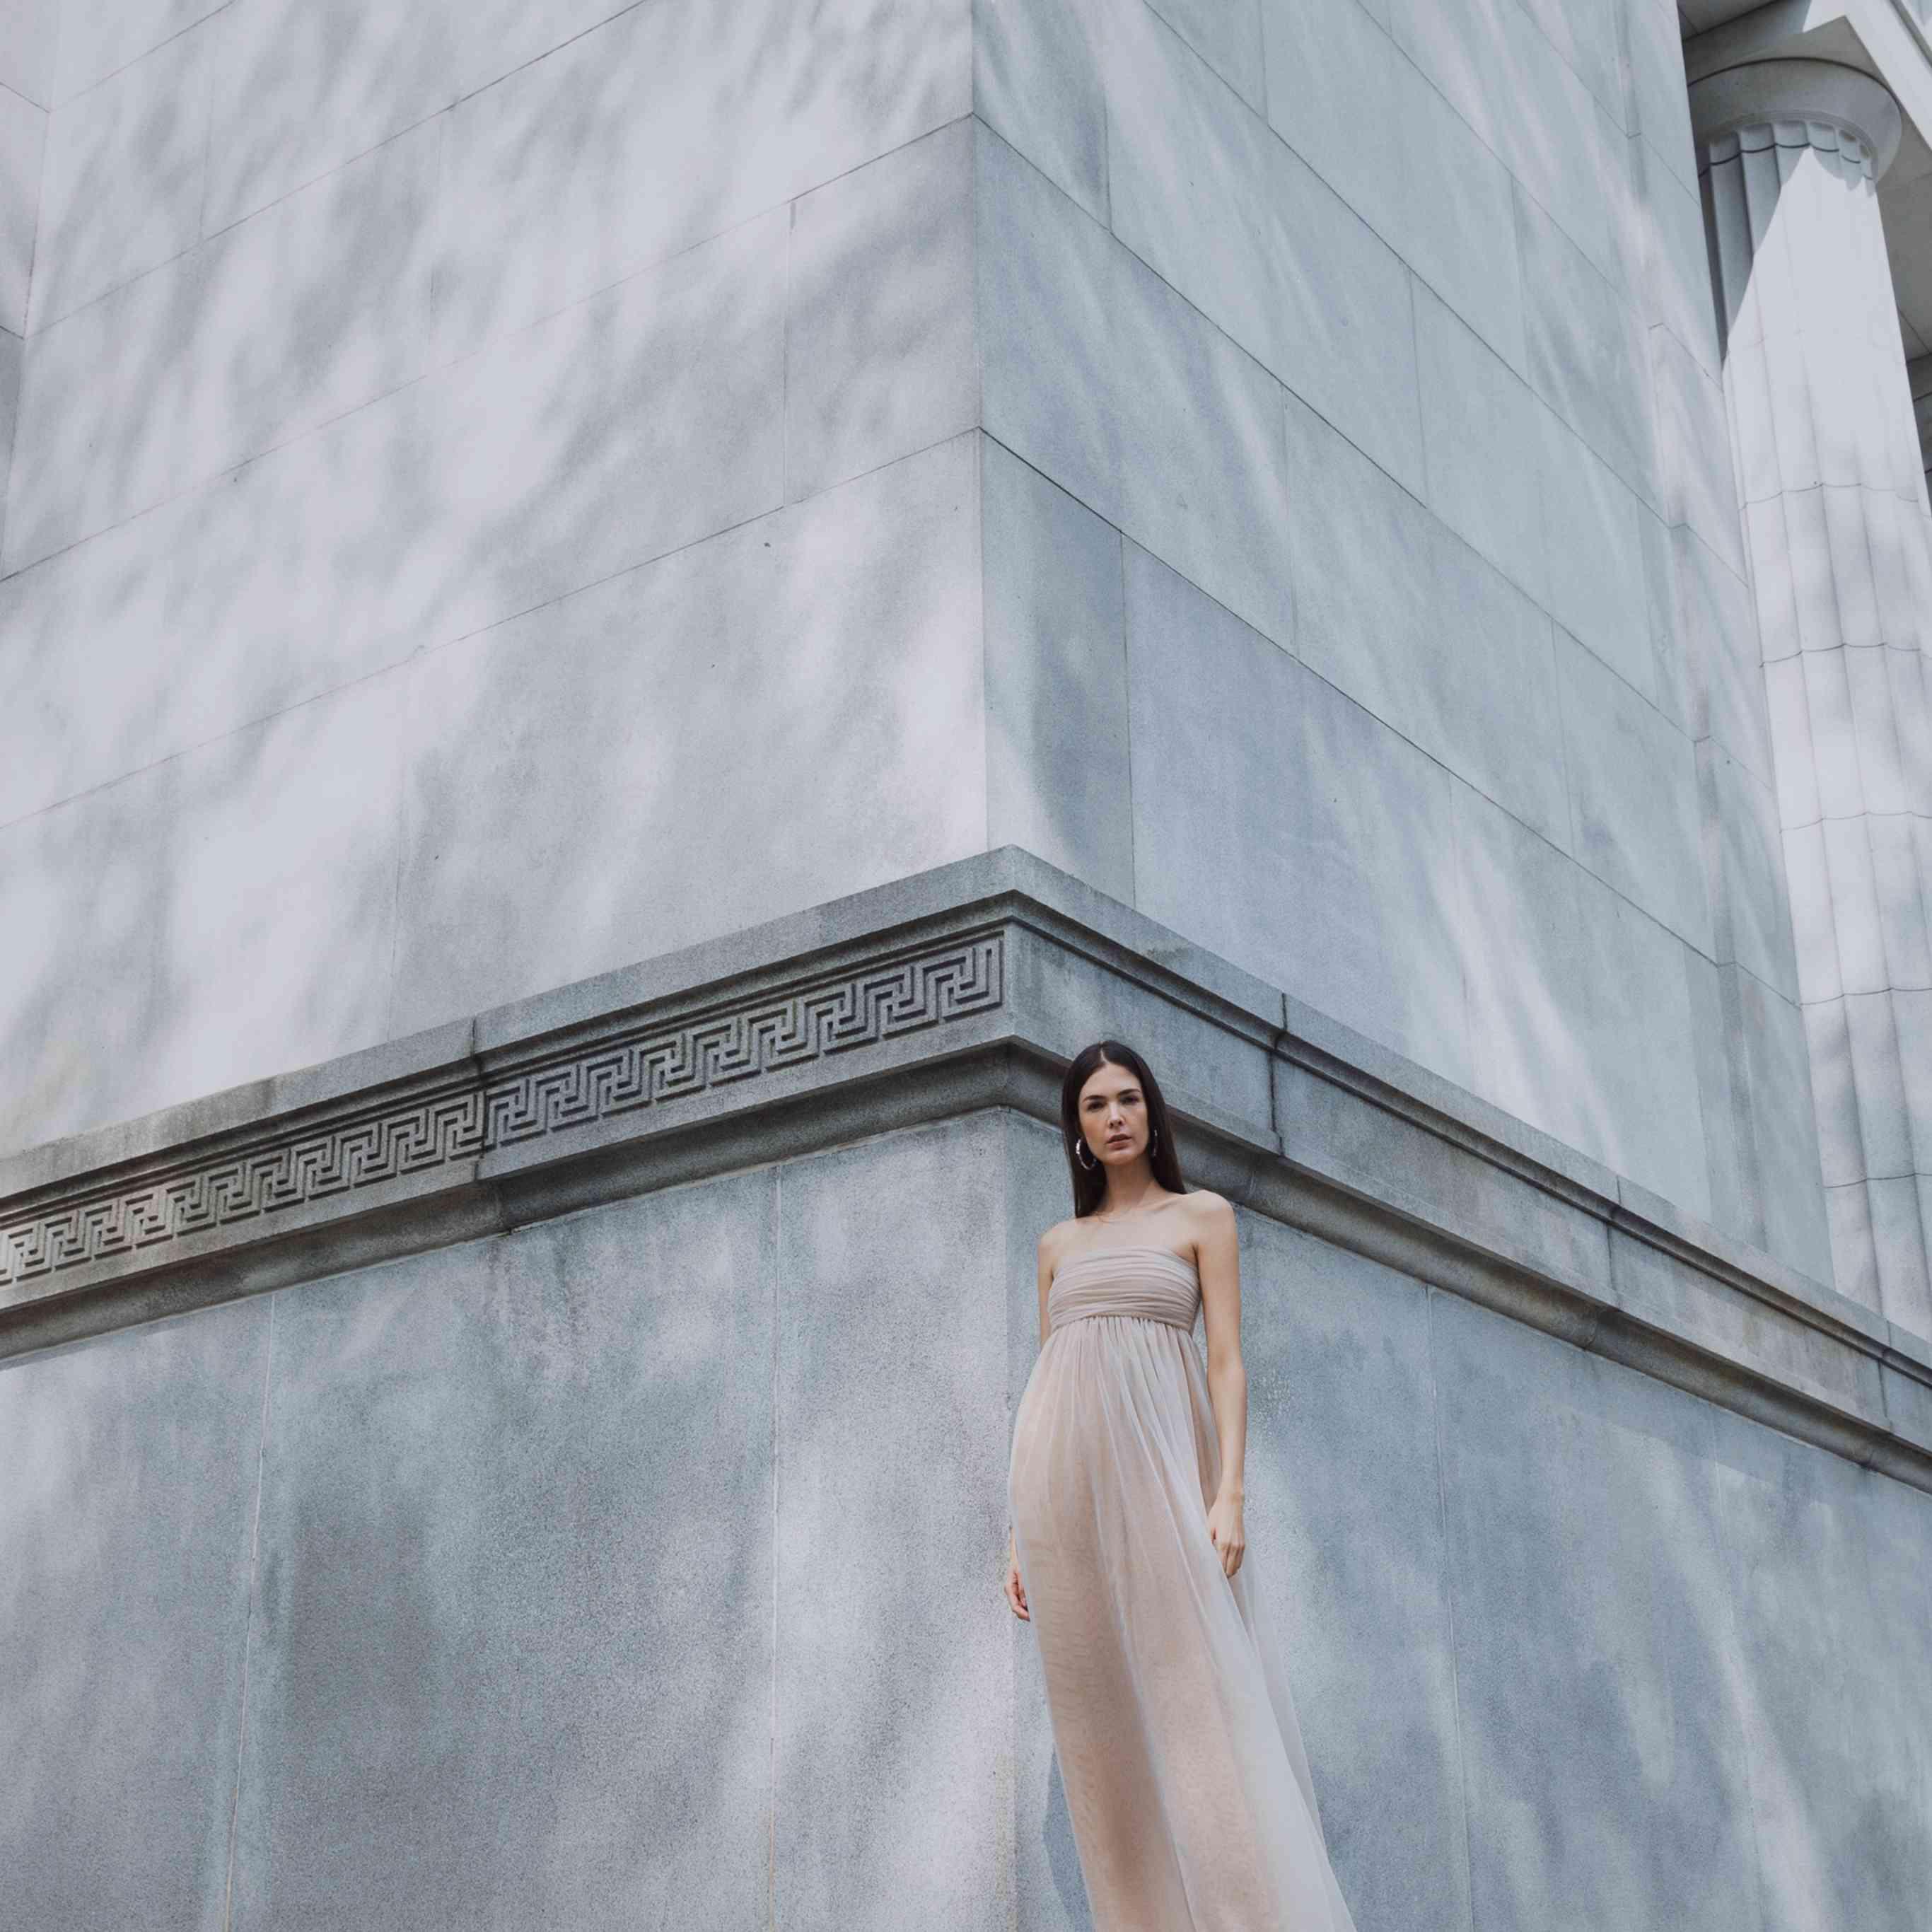 Model in strapless wedding dress with empire waist